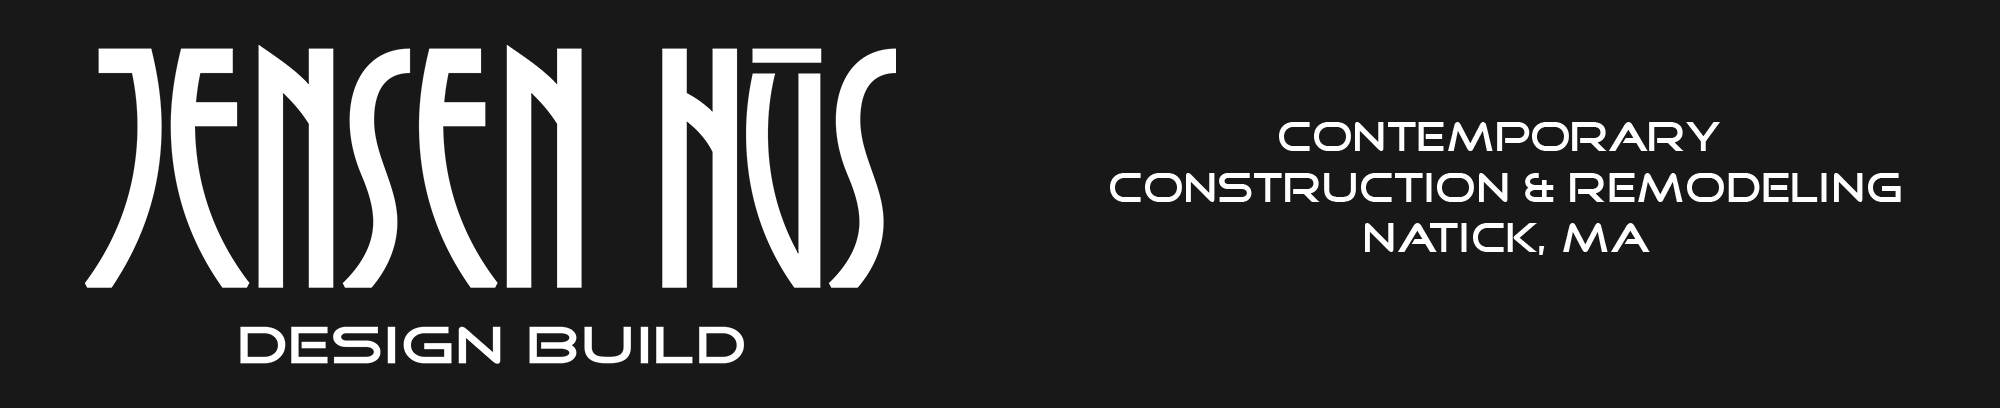 Jensen Hus – Contemporary Design Build